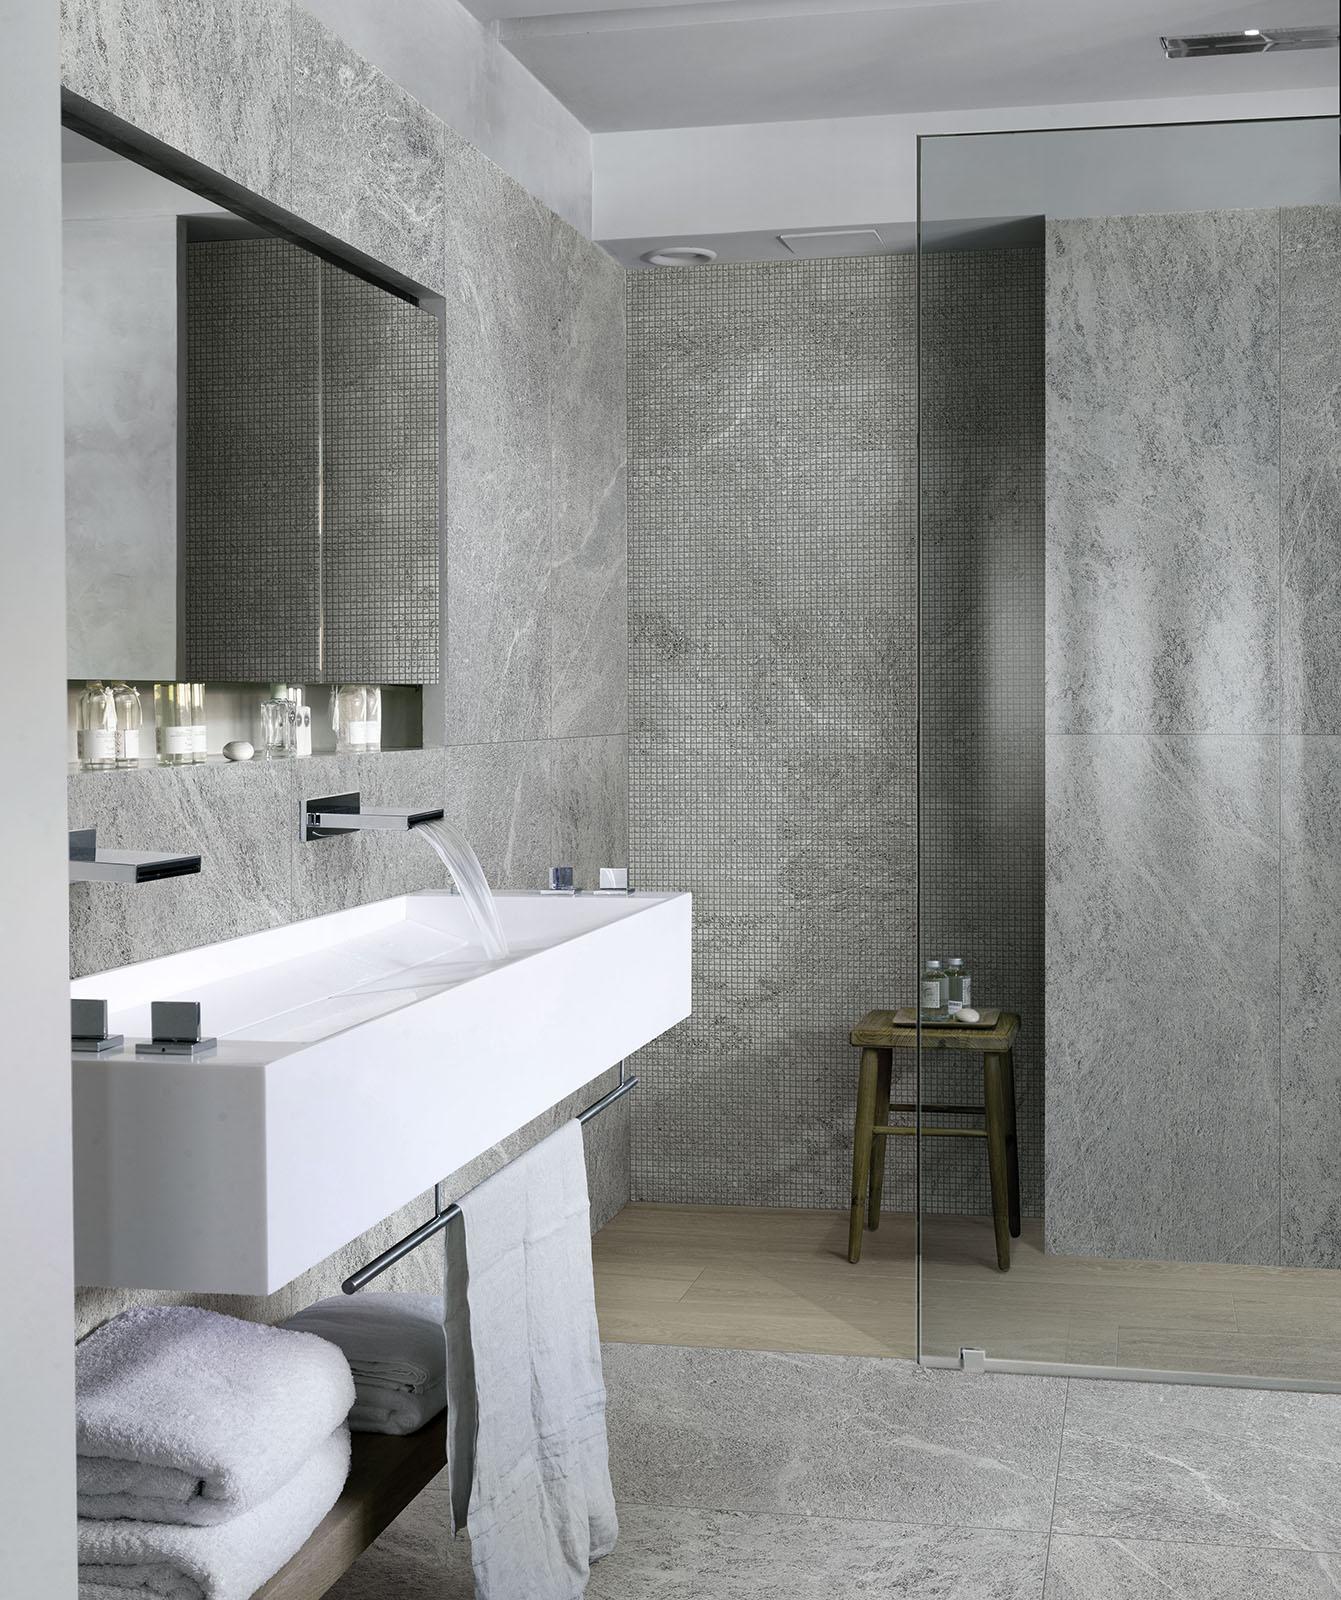 Carrelage salle de bain c ramique et gr s c rame marazzi for Carrelage bain